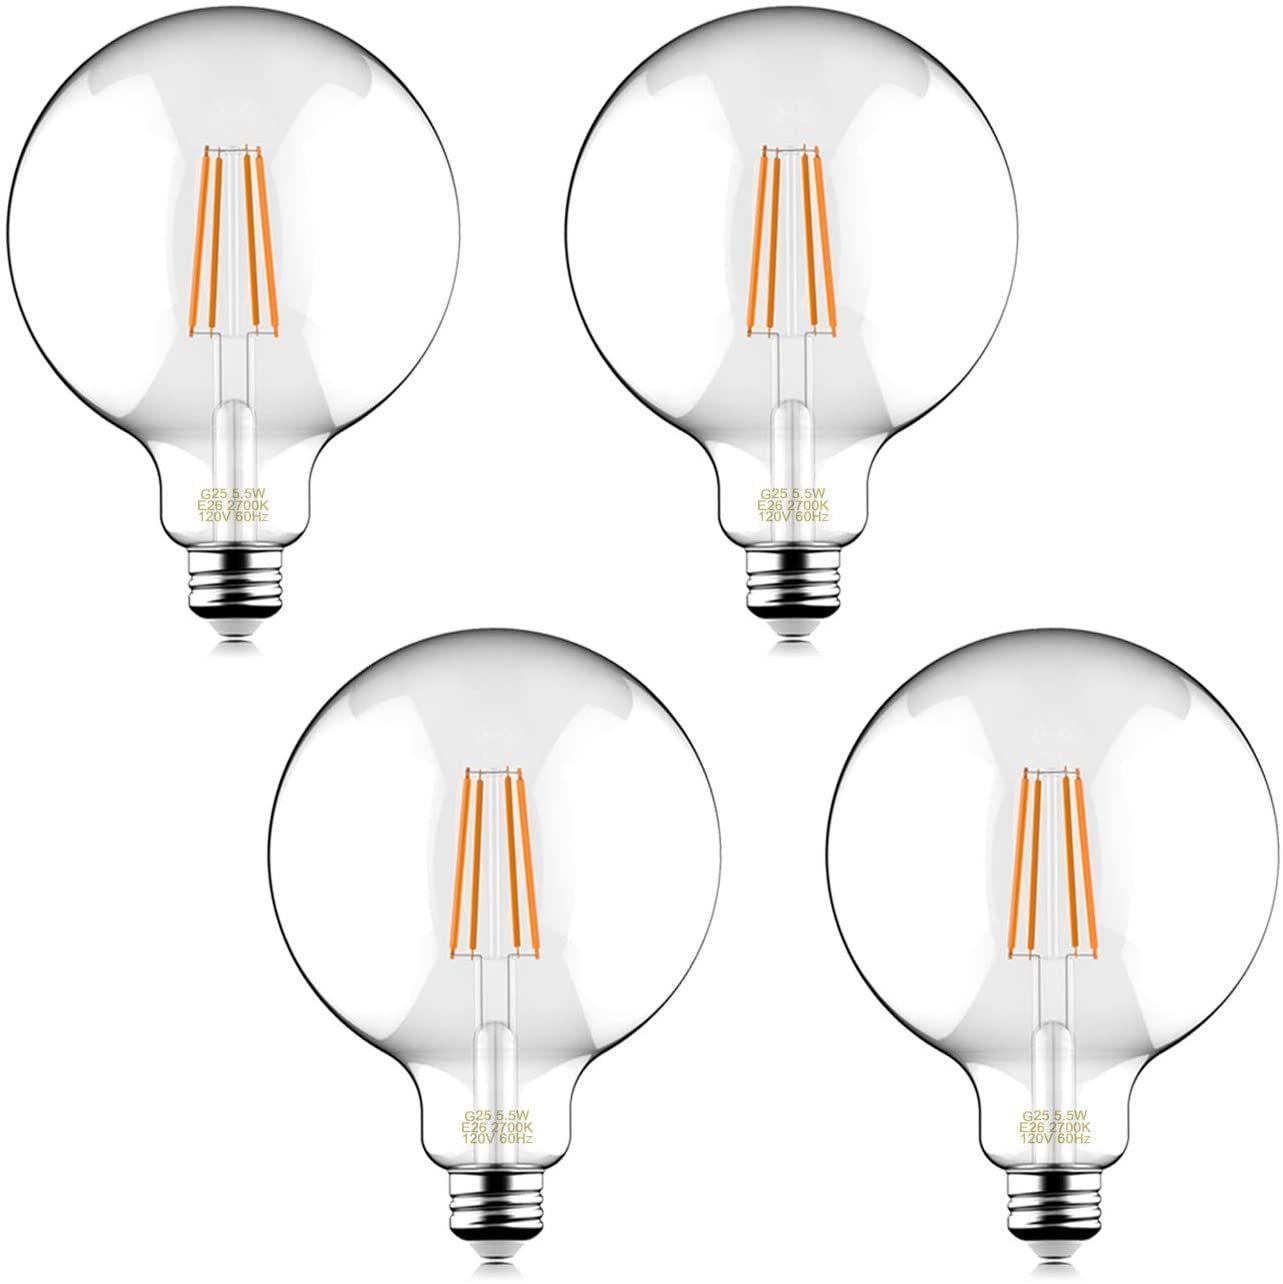 G25 LED Edison Bulb